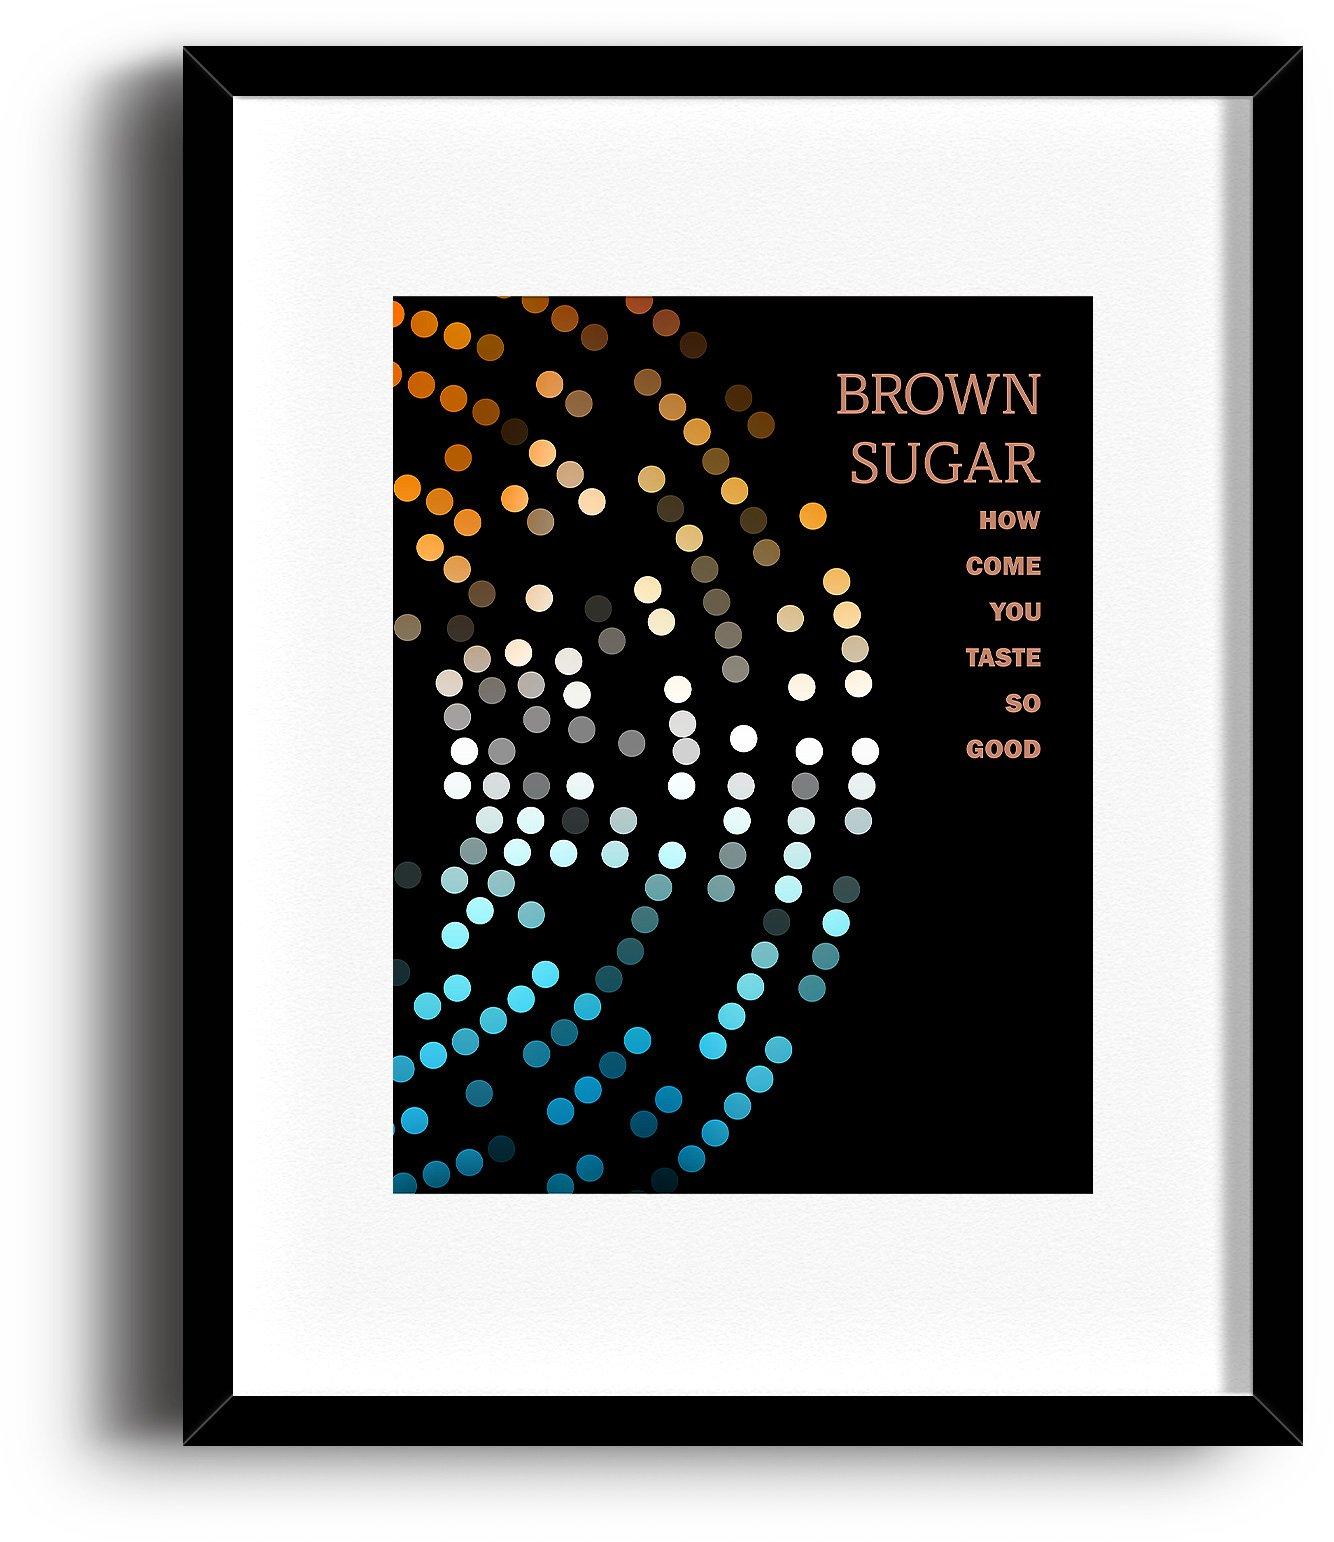 brown sugar lyrics - photo #12